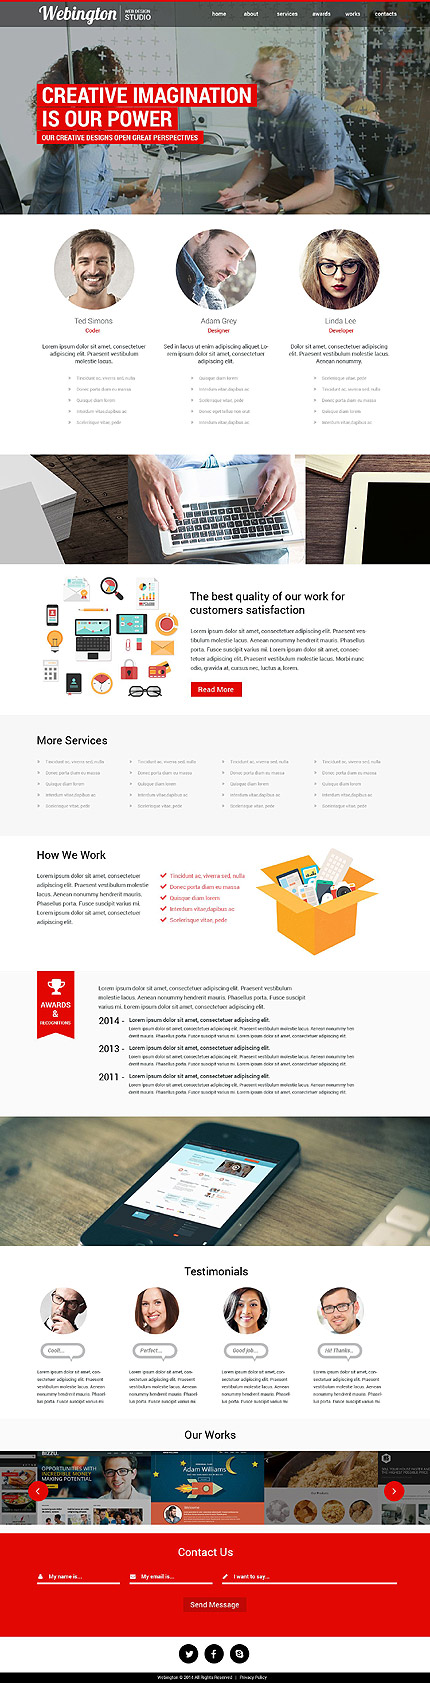 Sablon de | Web design | ID: 865